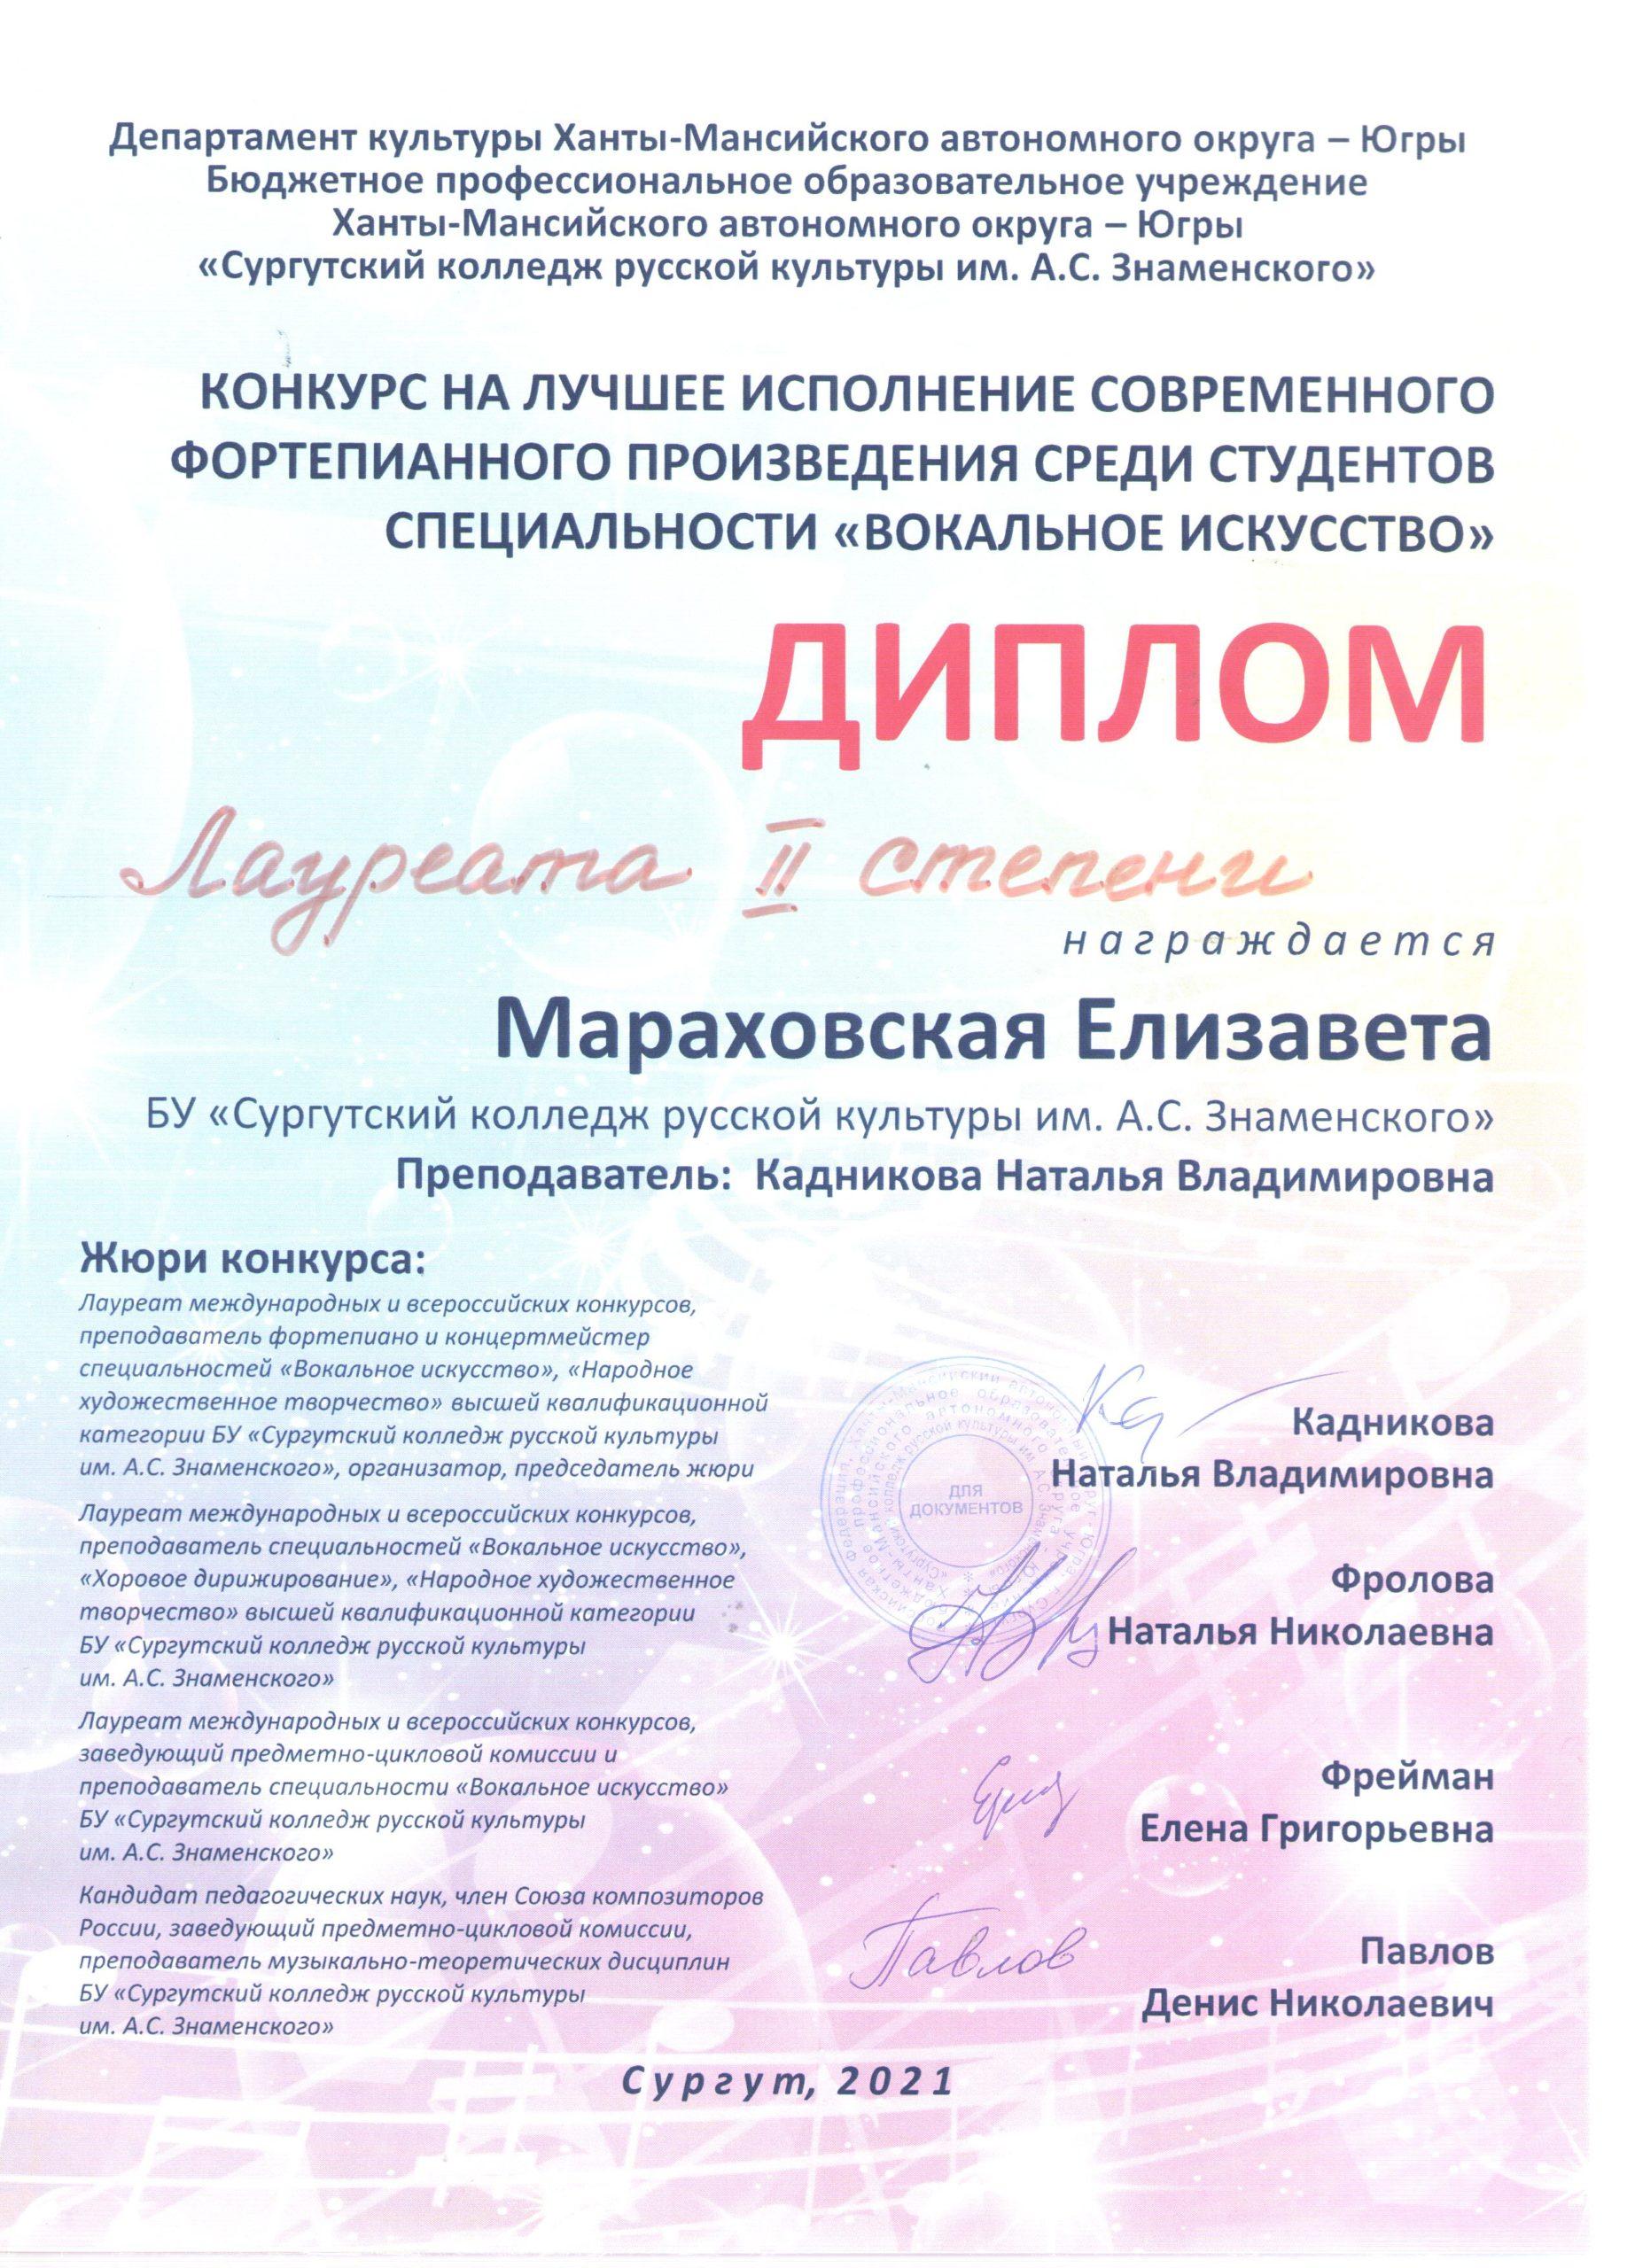 Мараховская